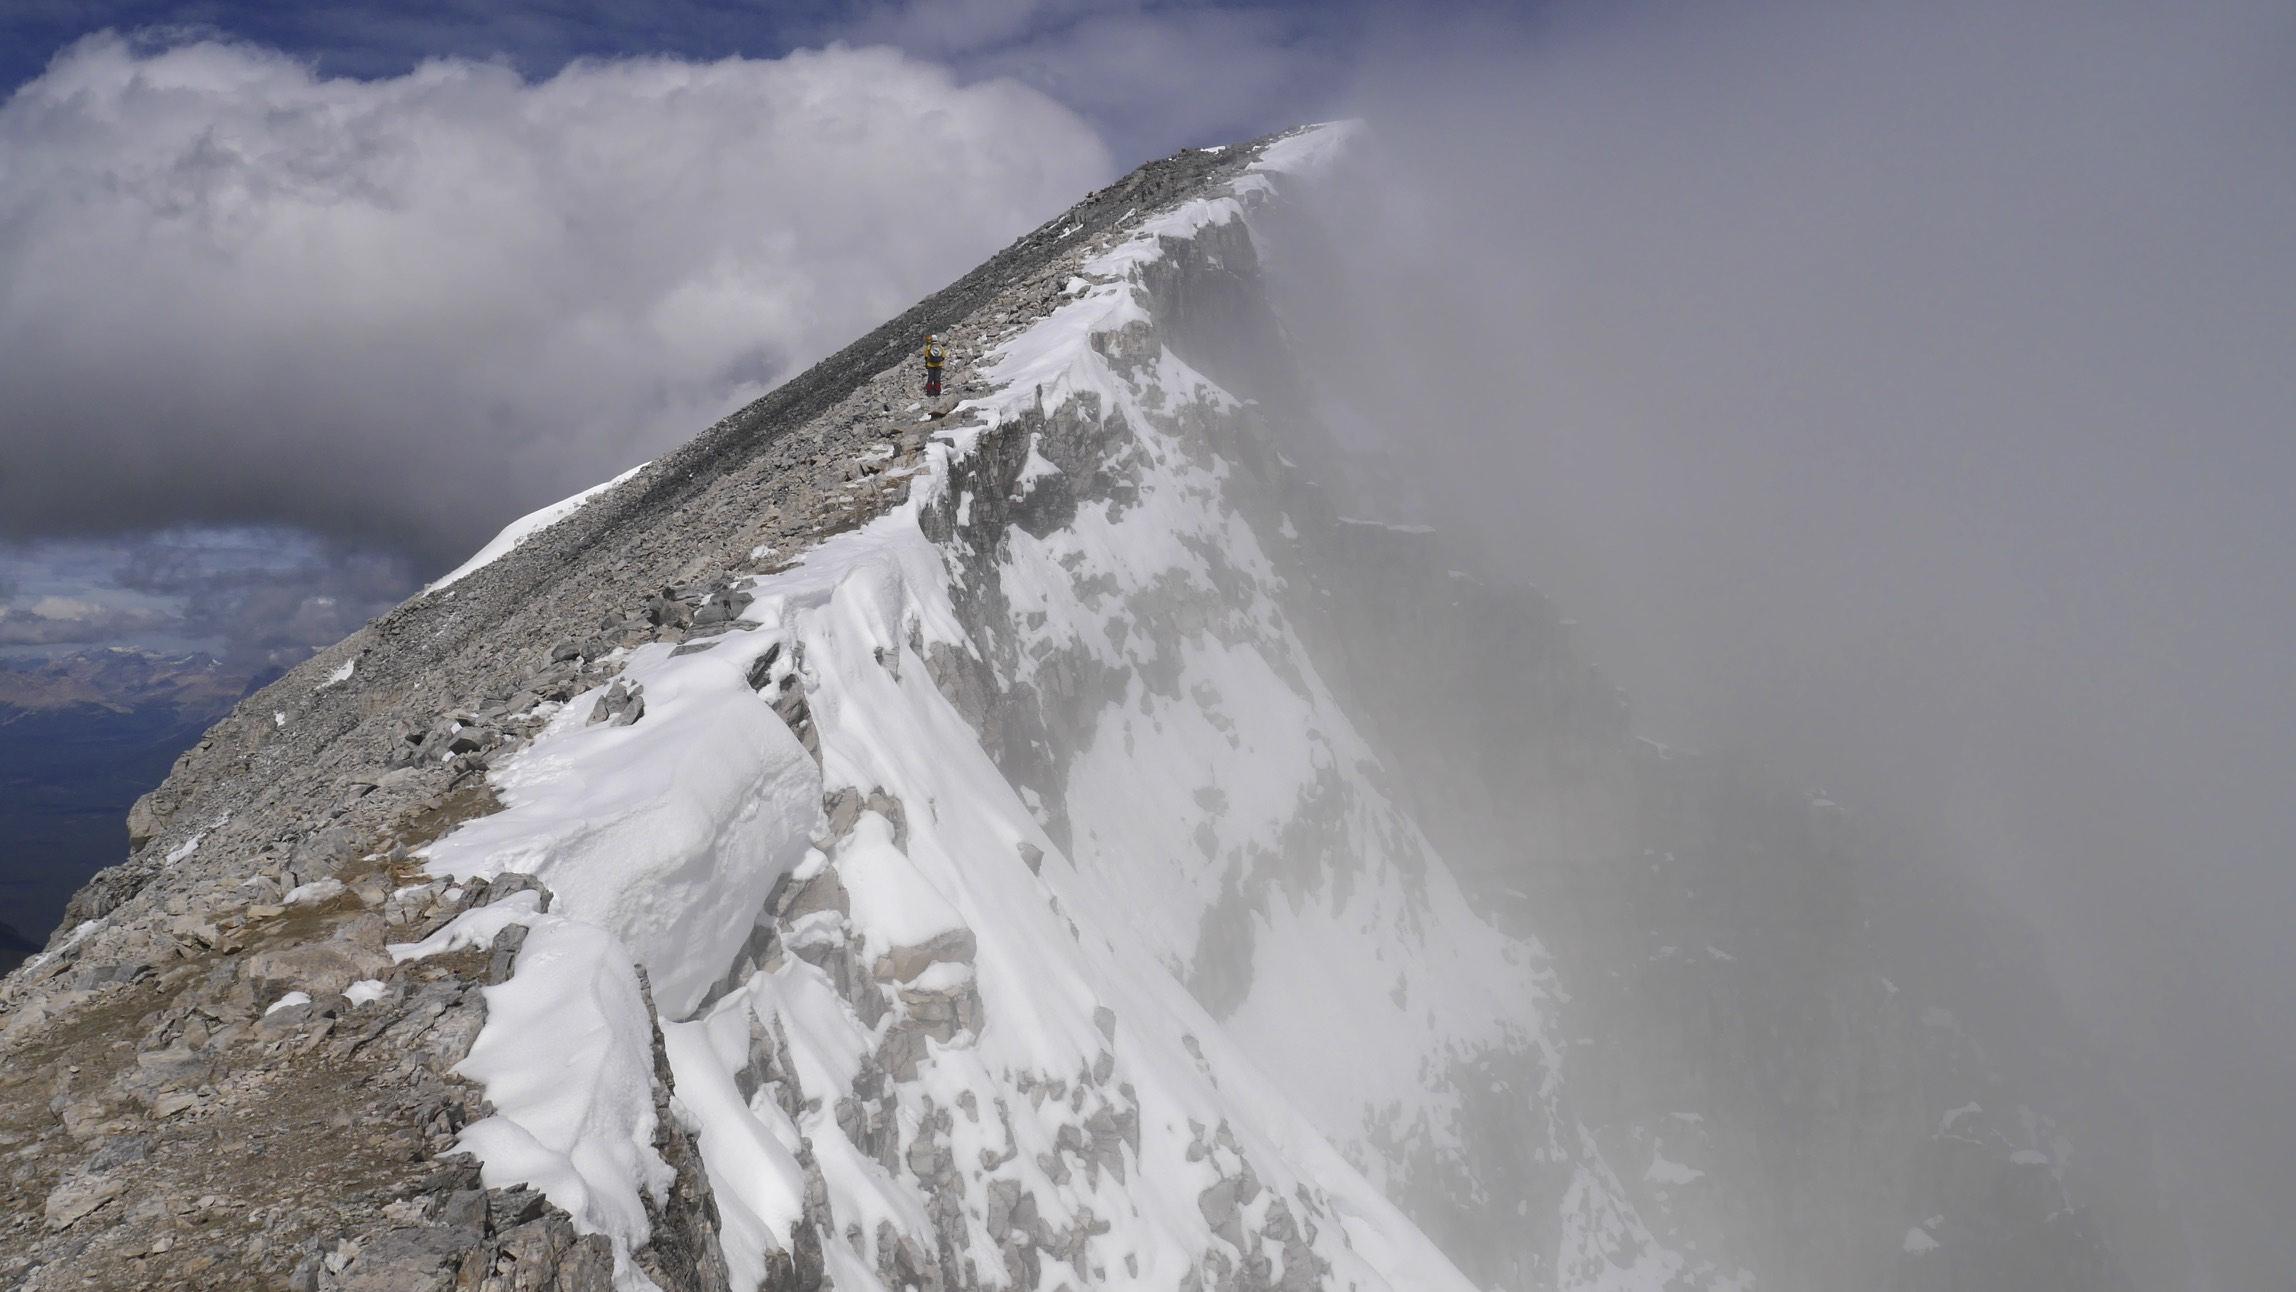 Mt. Temple